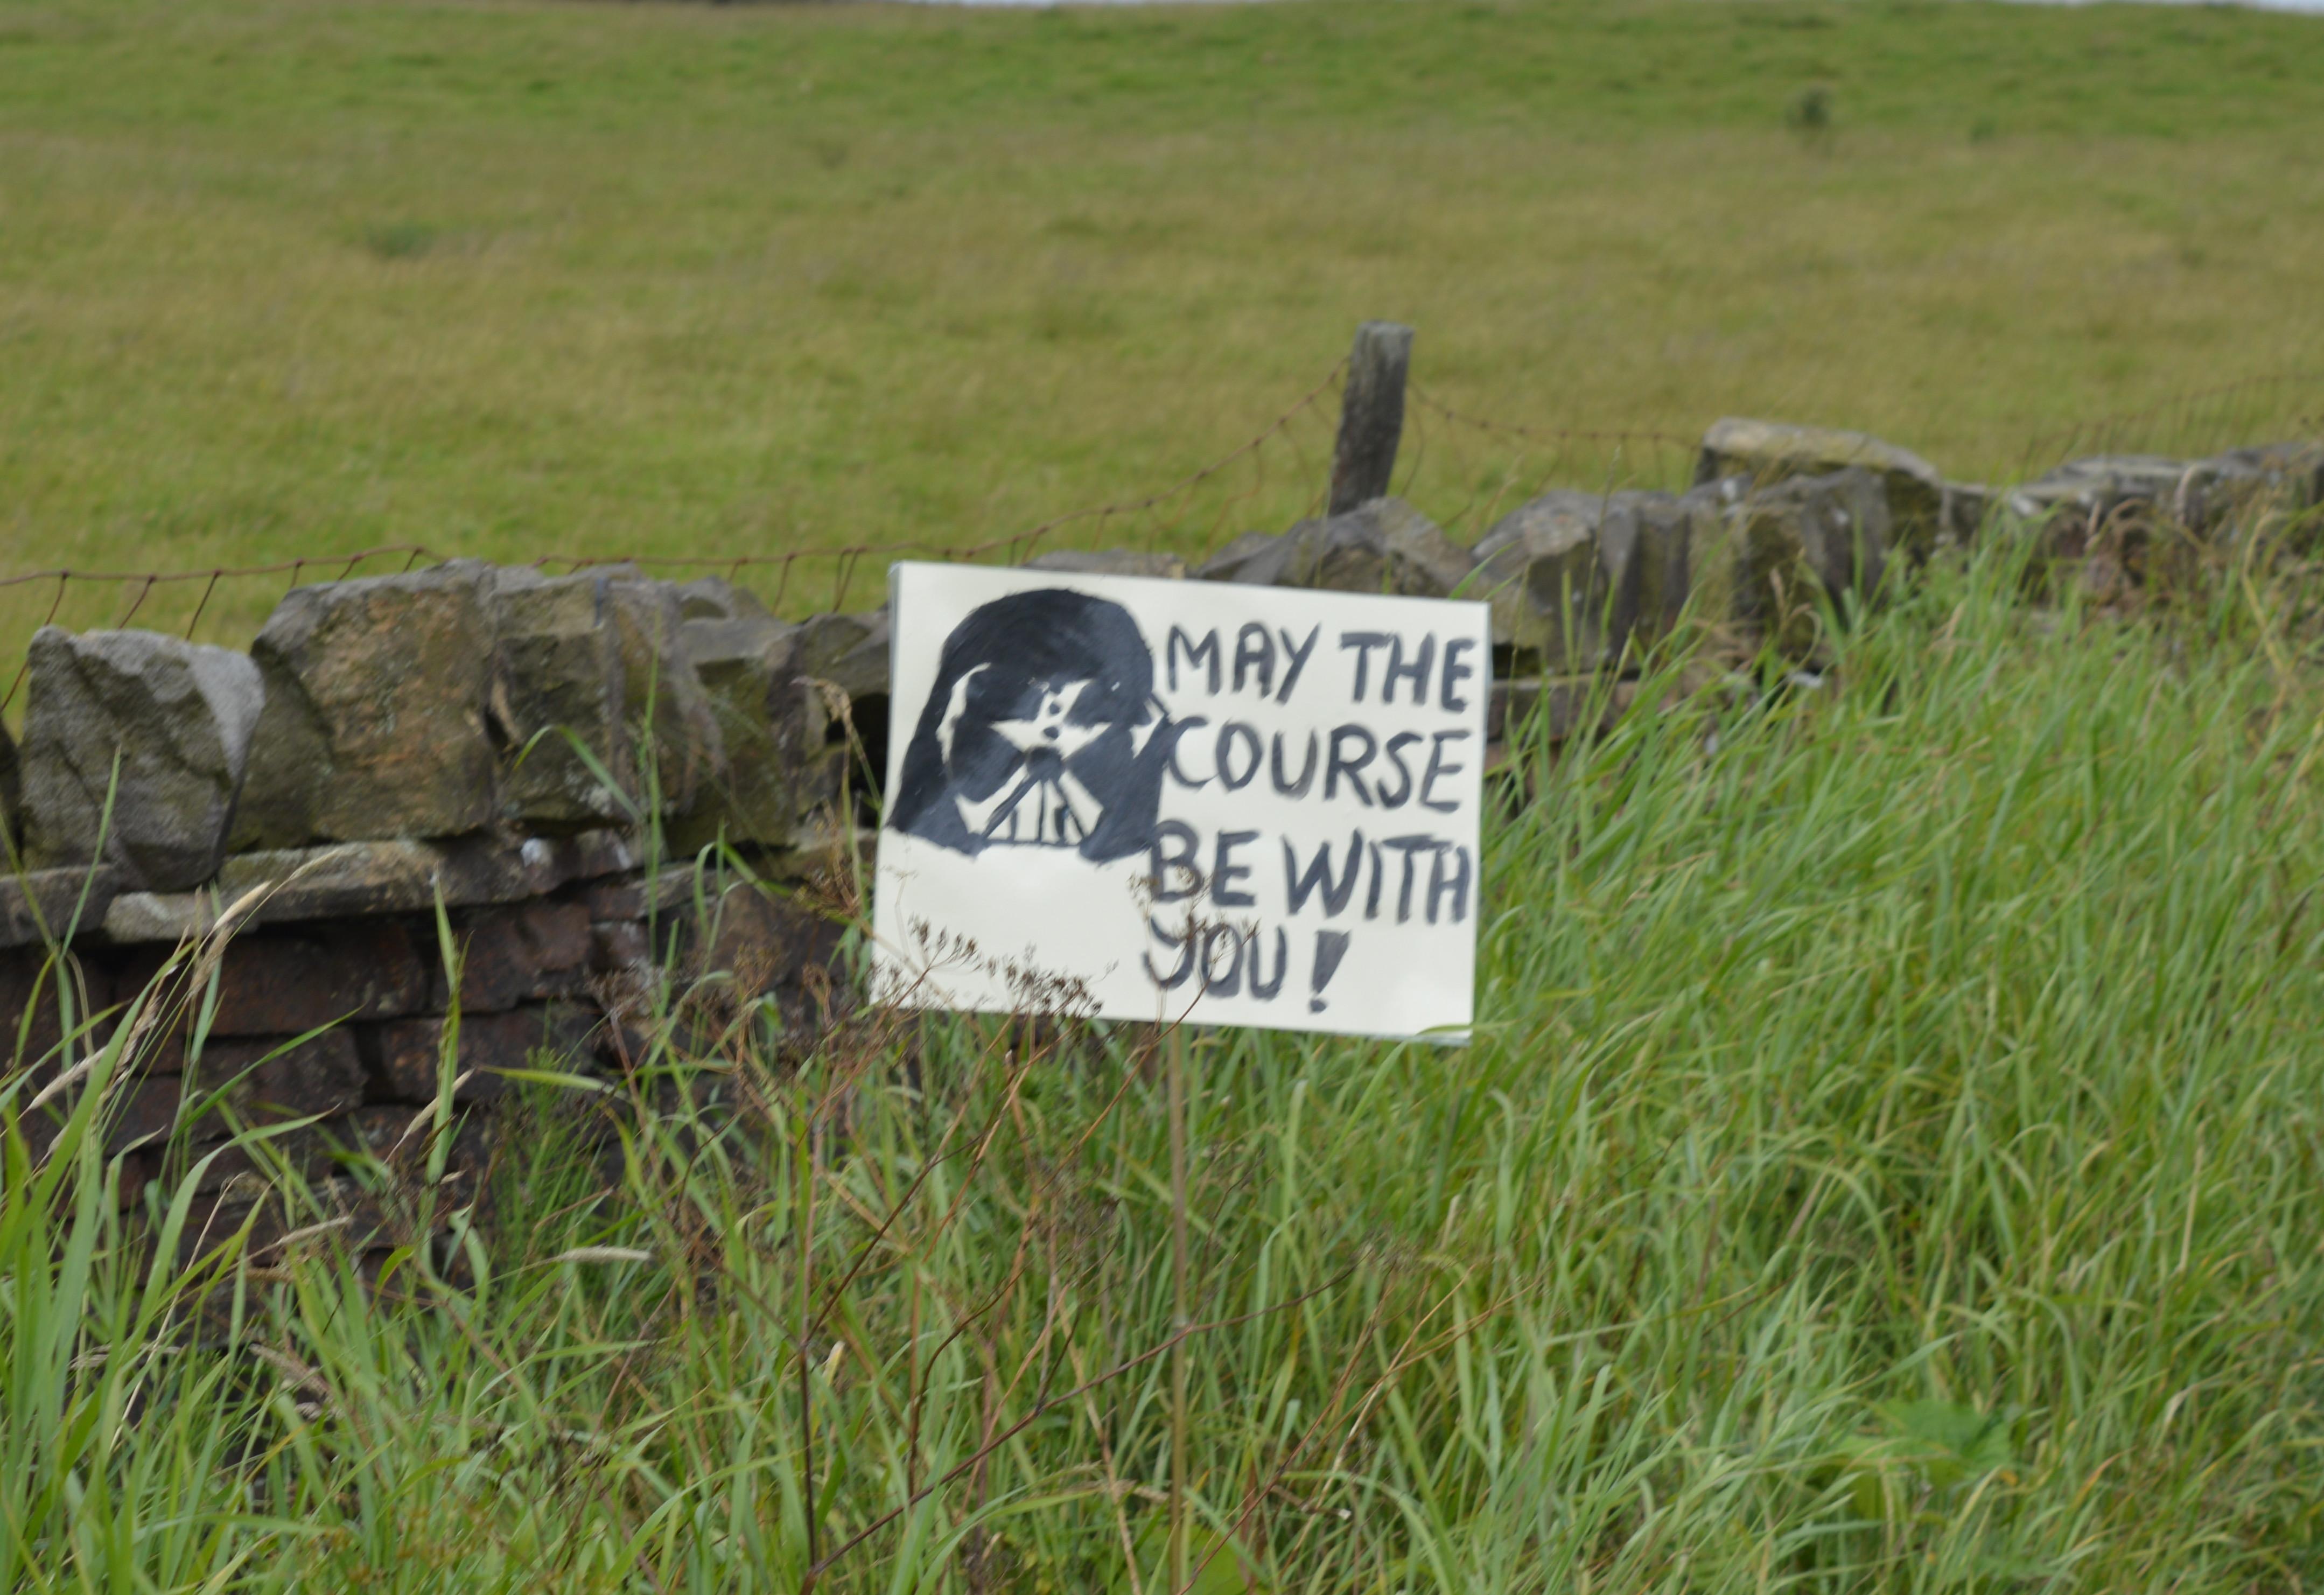 Inspirational signs at Caldwell. Photo by Adrienne Olszewska